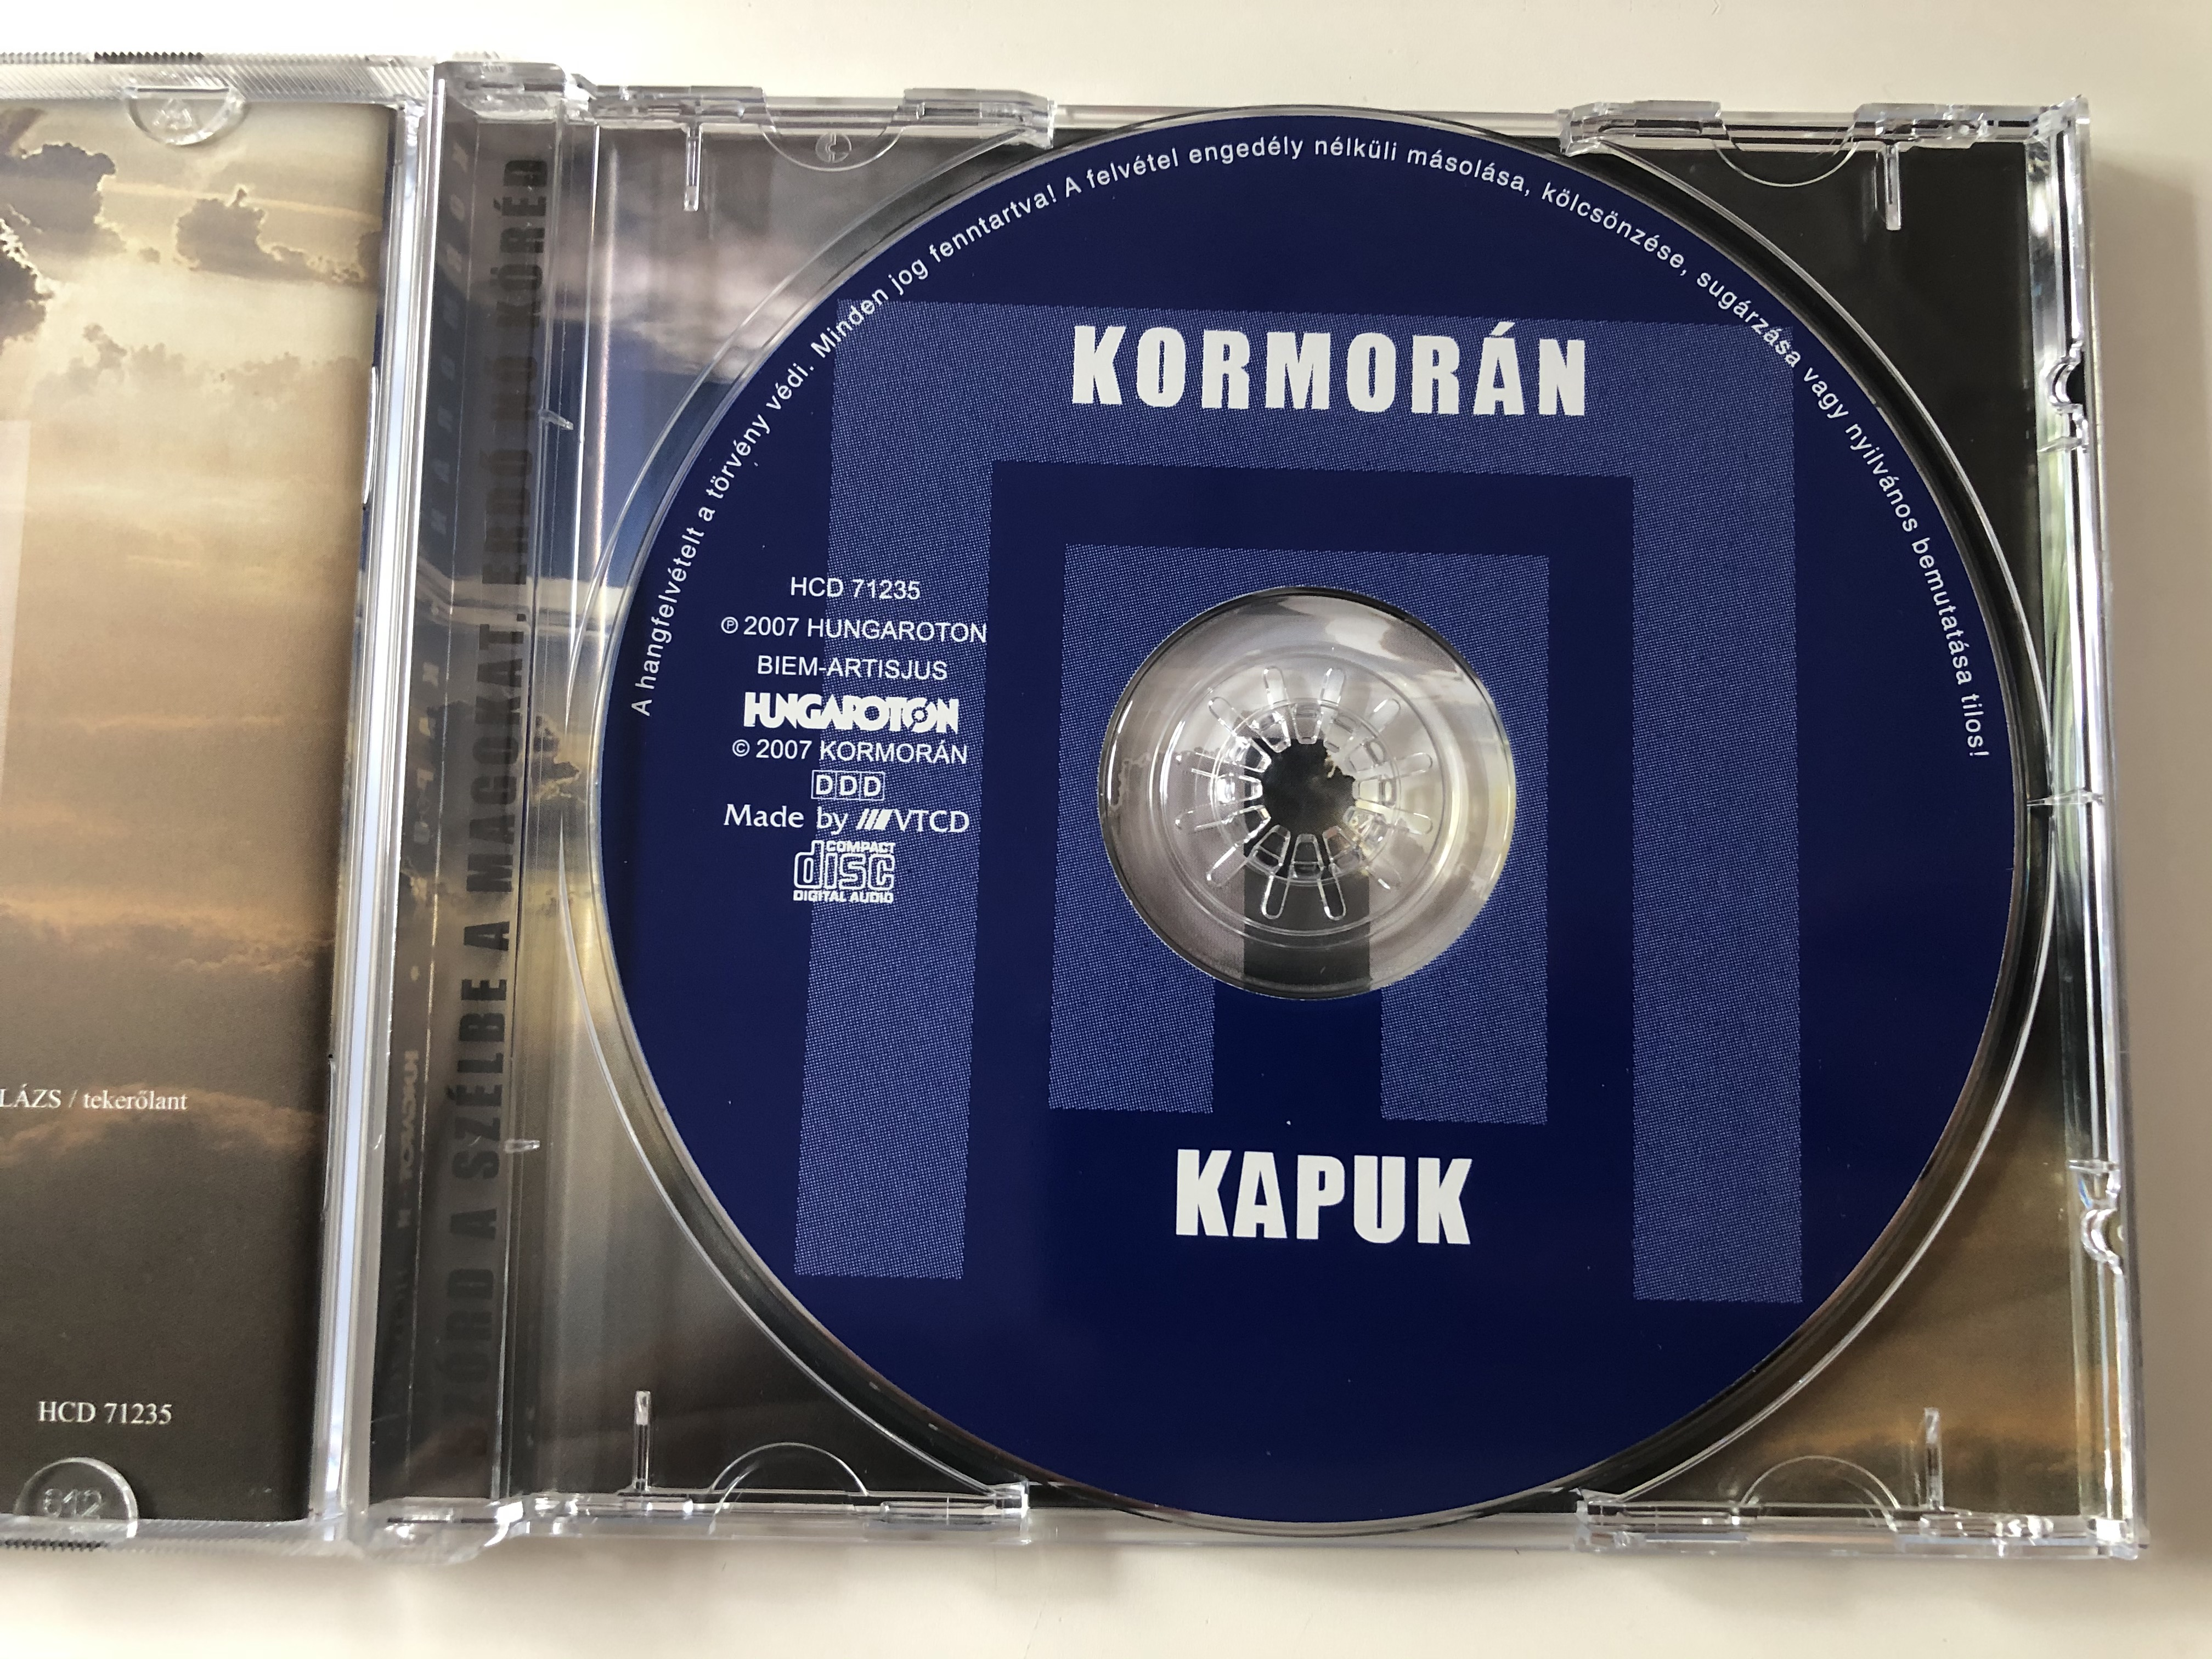 kormor-n-kapuk-hungaroton-audio-cd-2005-hcd-71235-8-.jpg